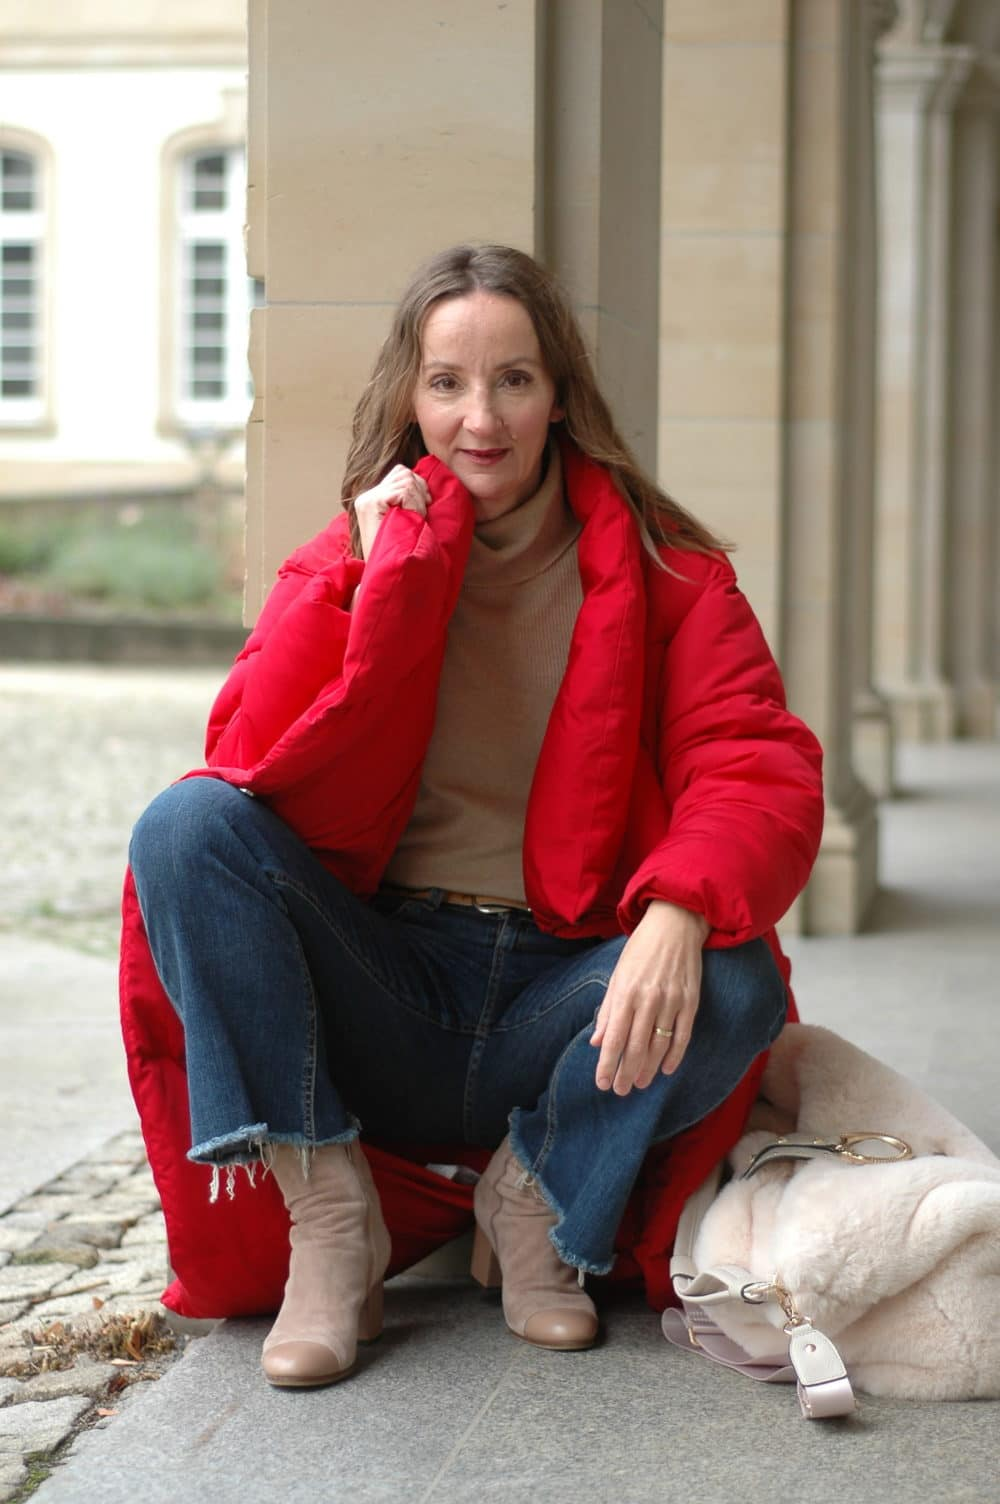 weihnachtsmarkt-frankfurt_daunen-mantel_jeans_fransen_modeblog_ü50_oceanblue-style